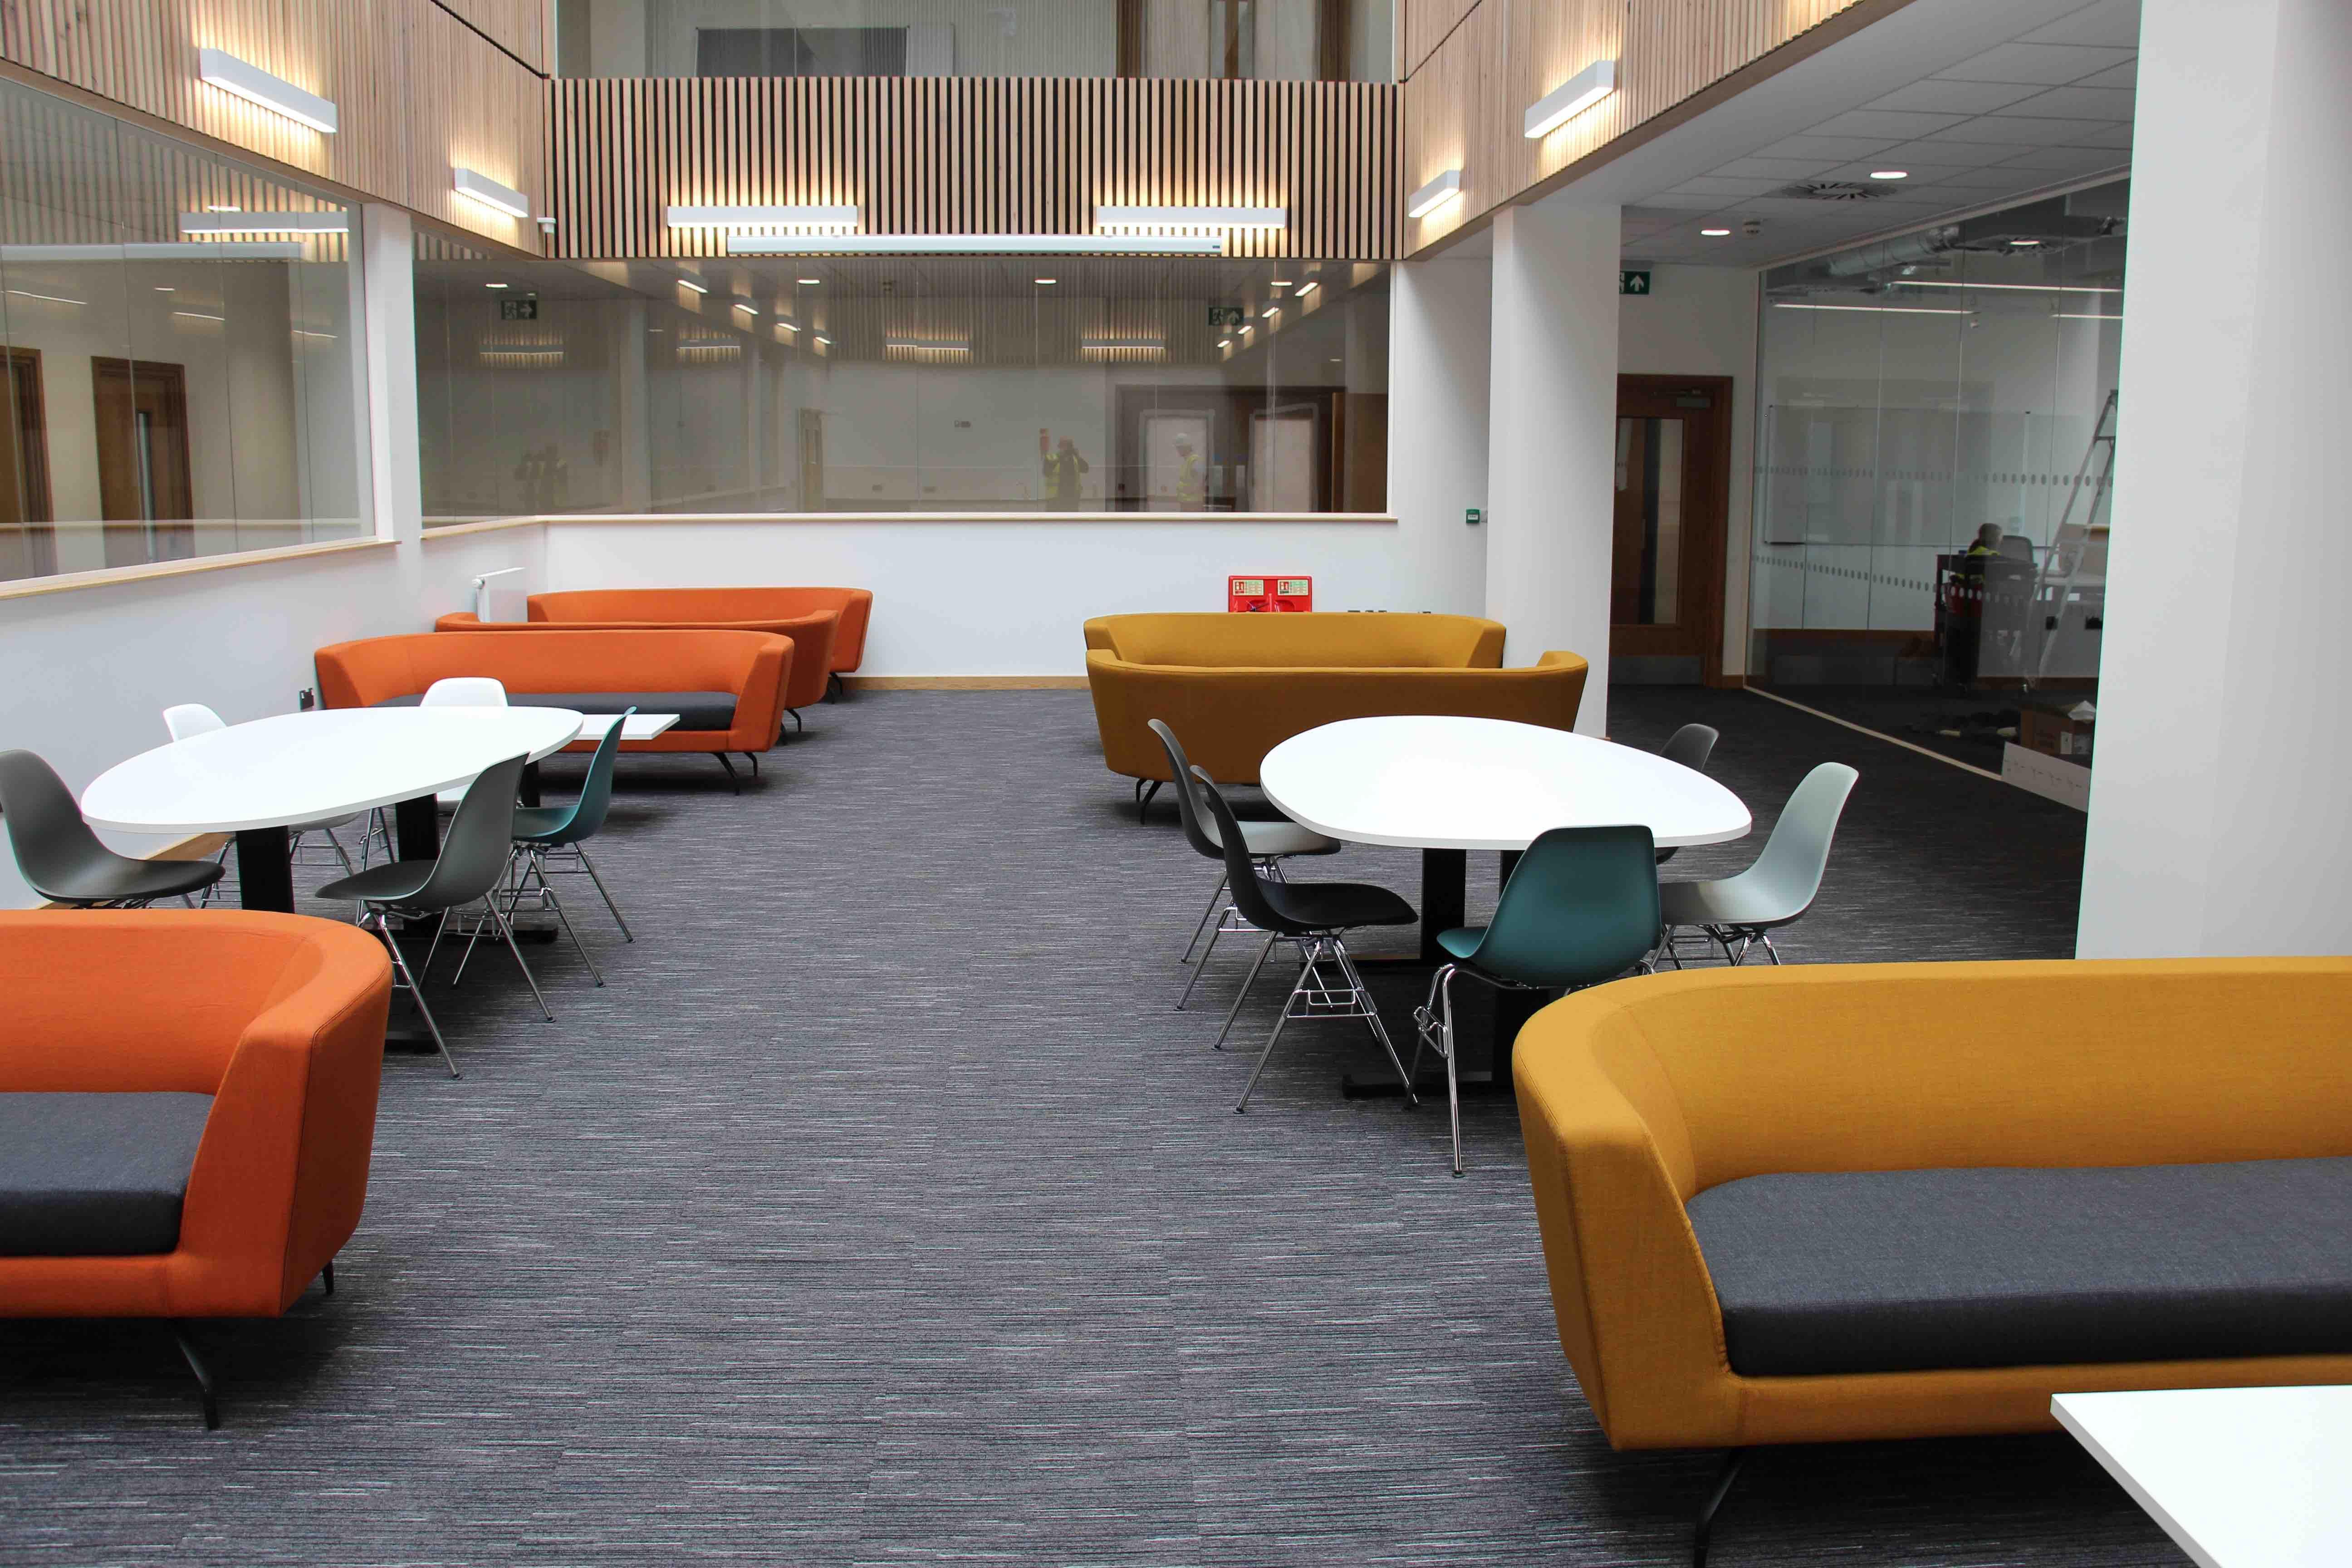 Swansea University Case Study